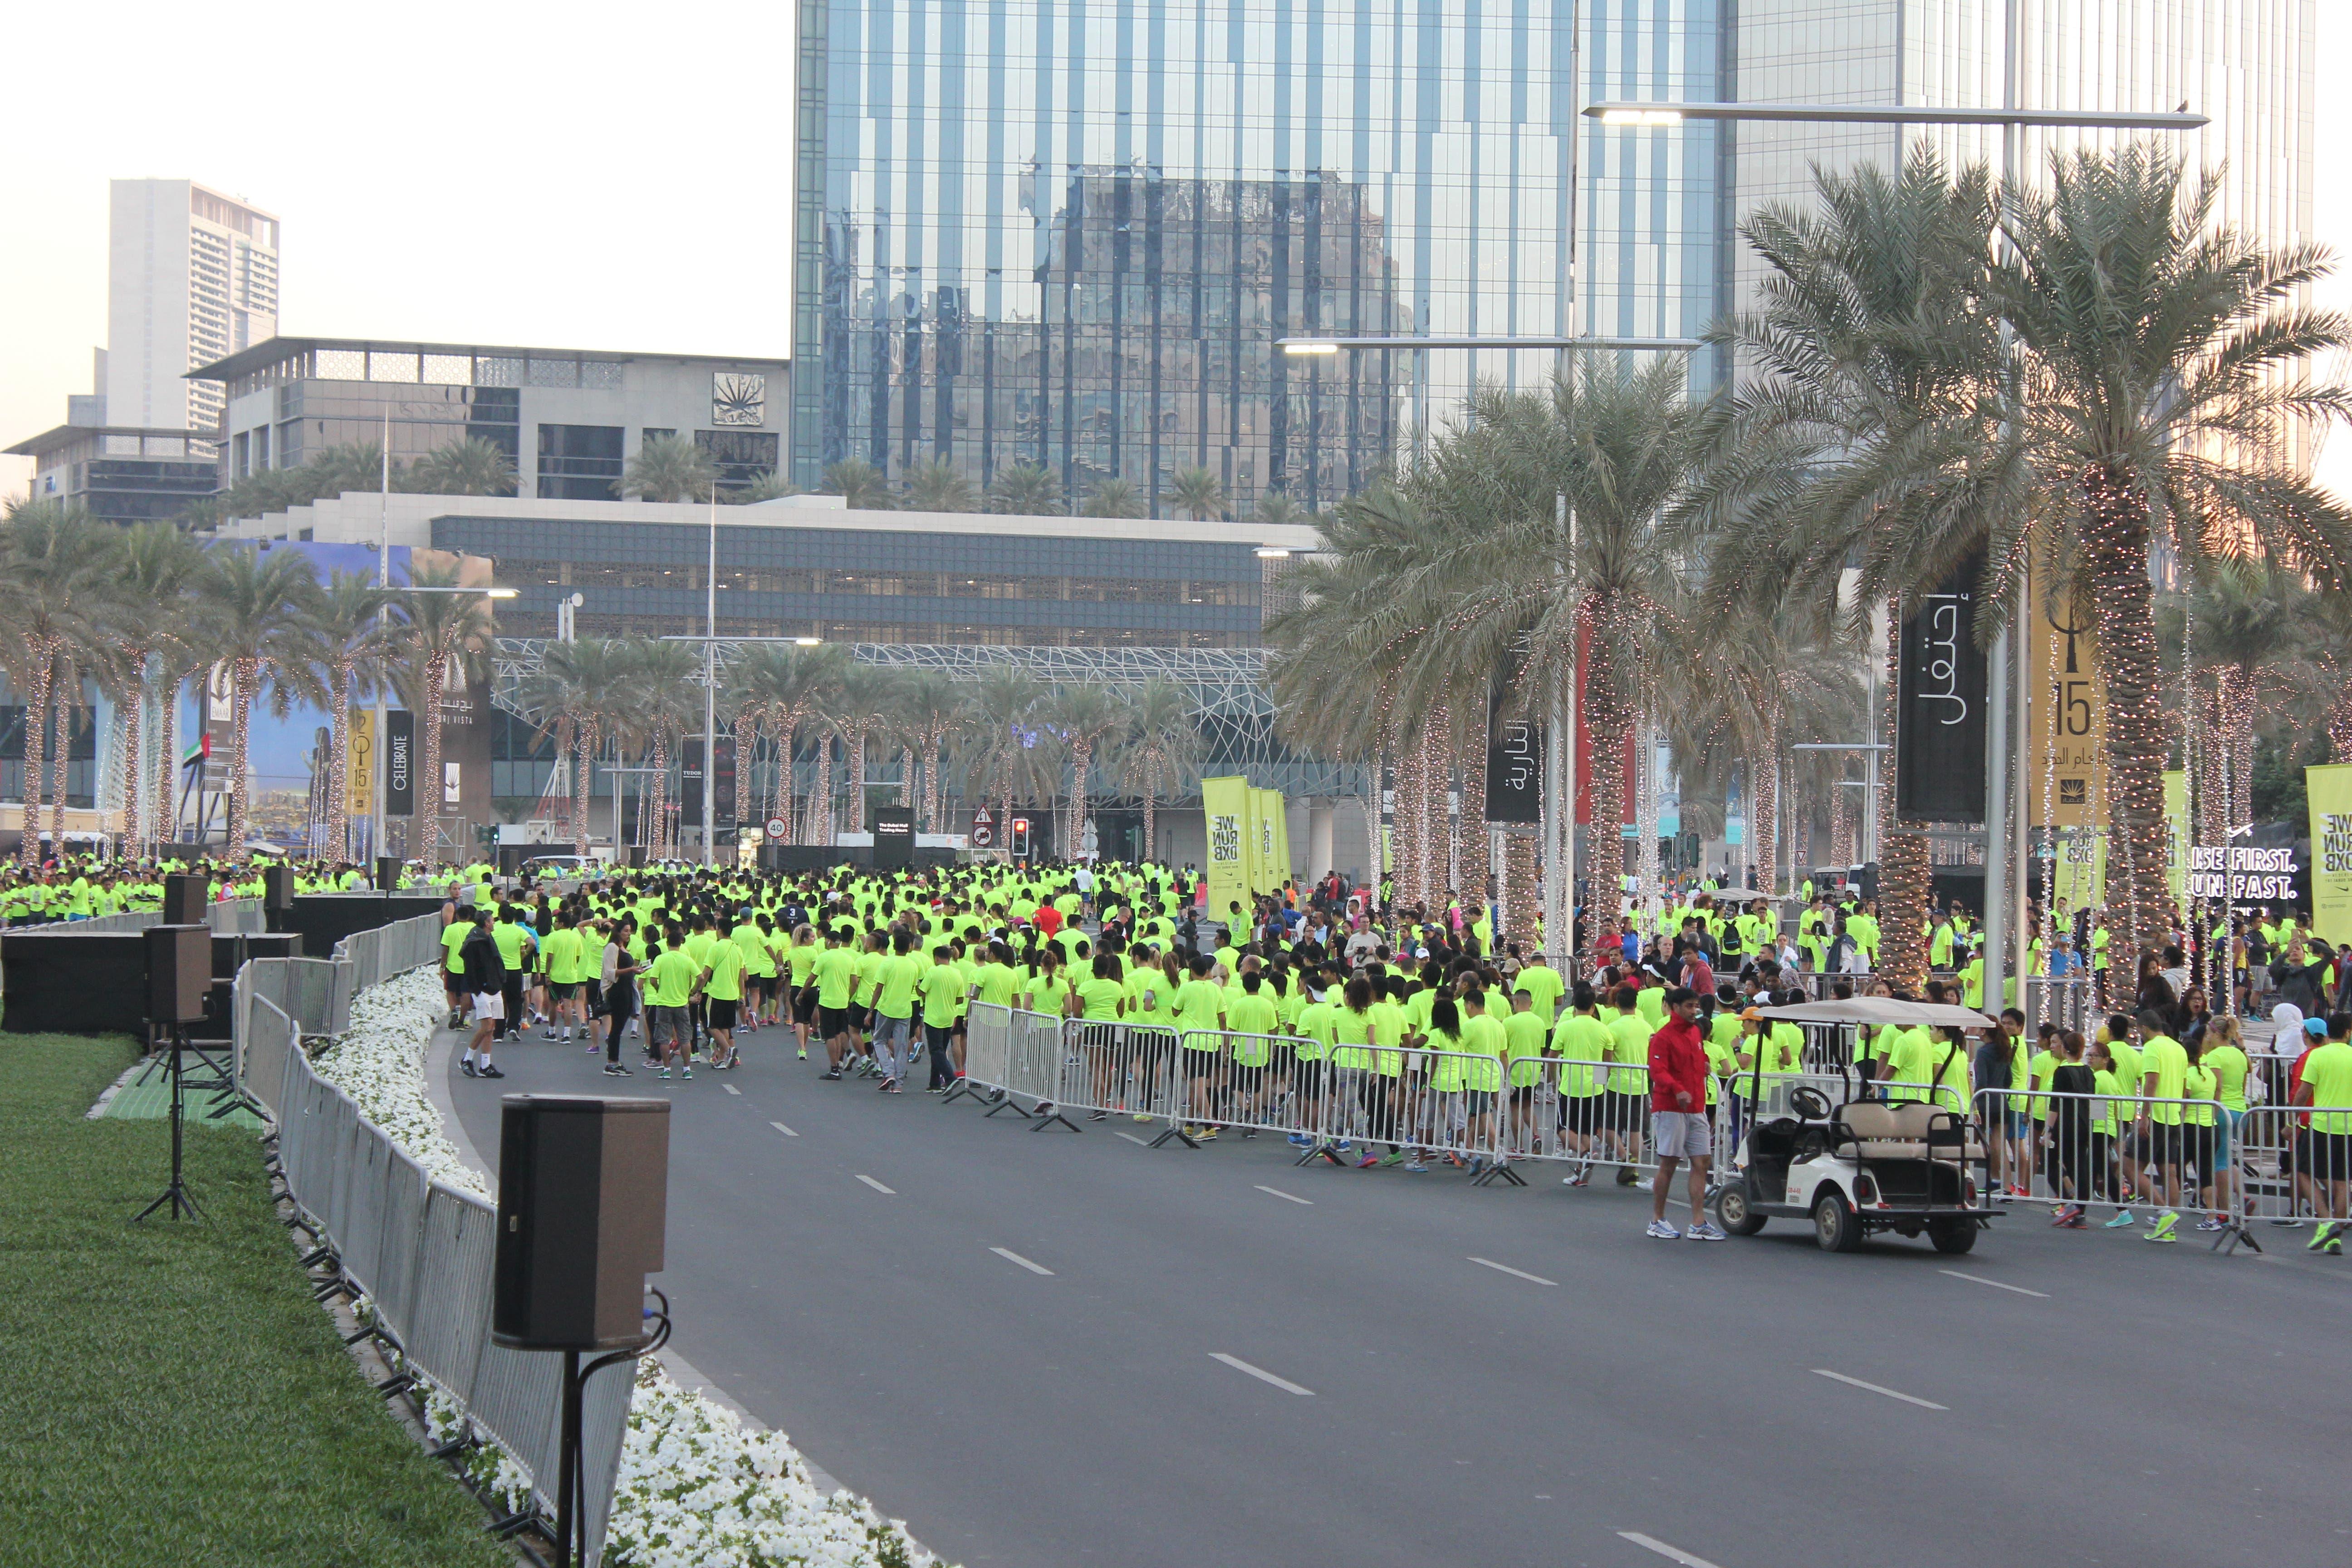 Thousands take on the #WeRunDXB race